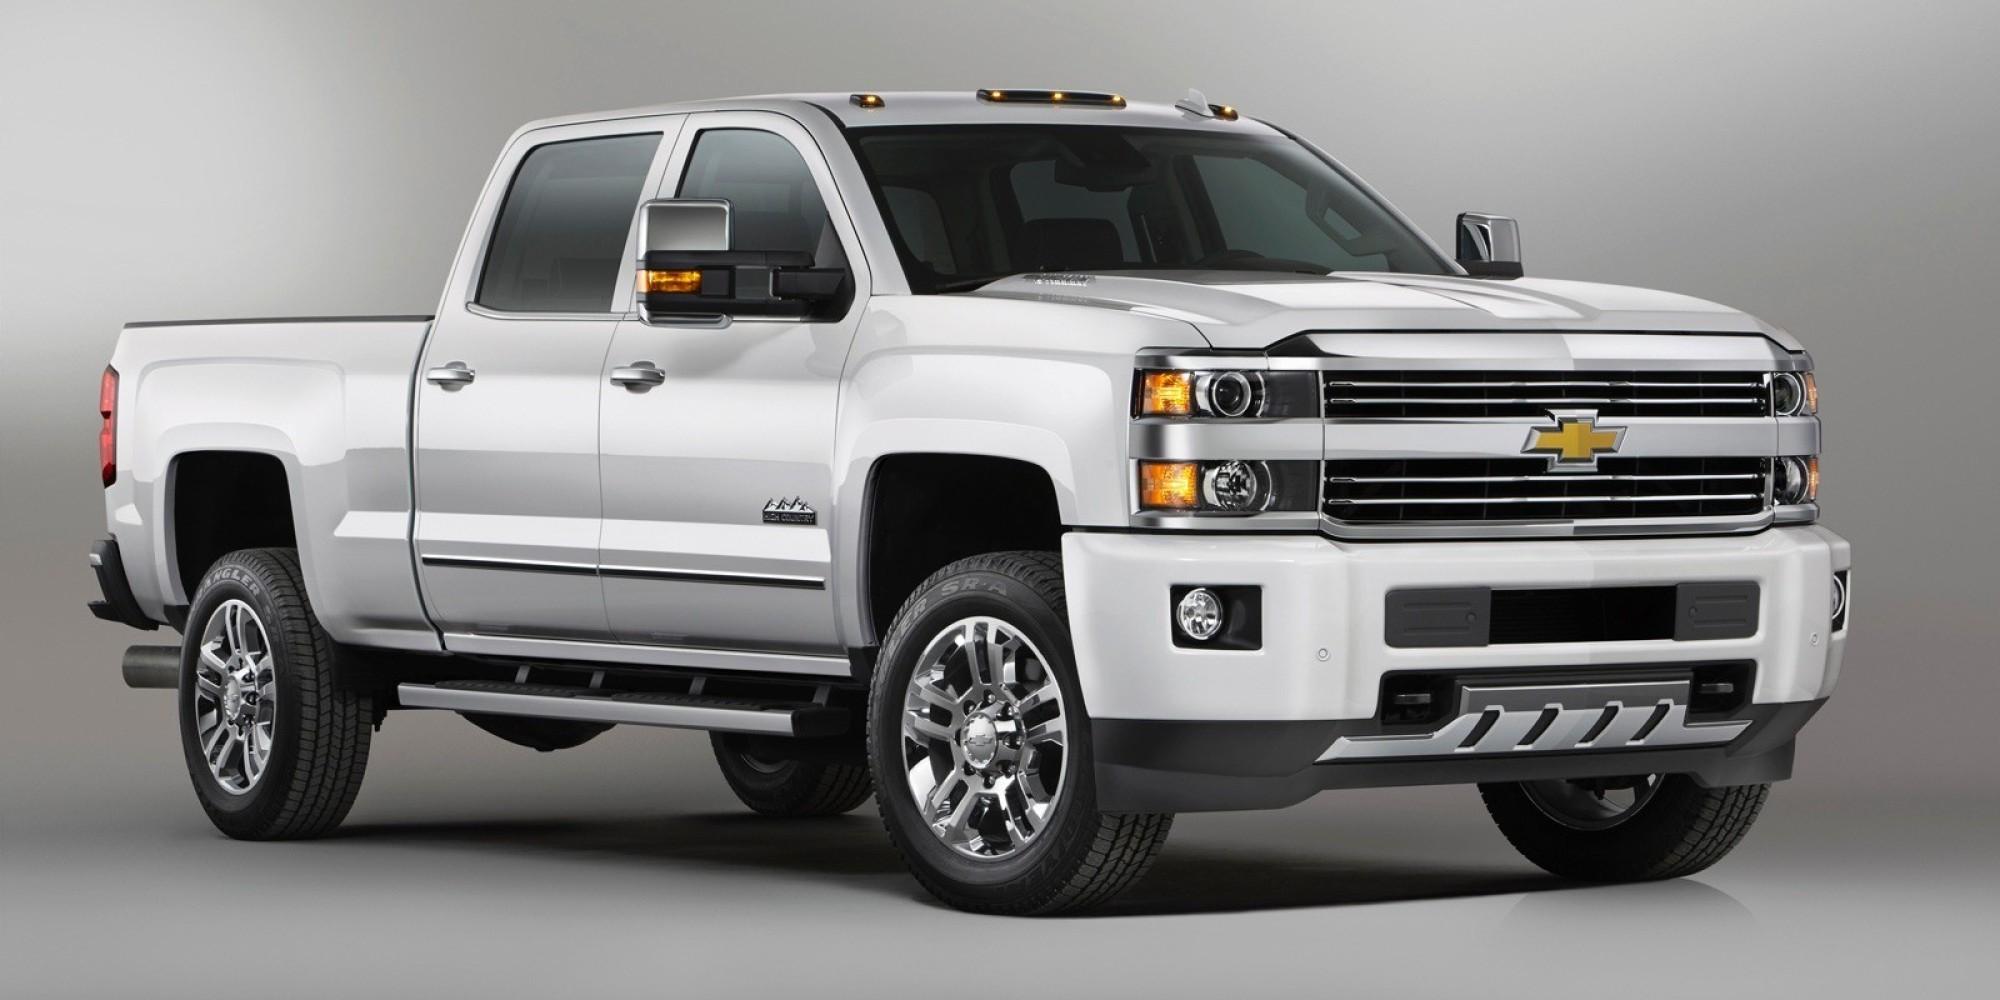 Chevrolet Silverado High Country 2015: Prueba de manejo | HuffPost